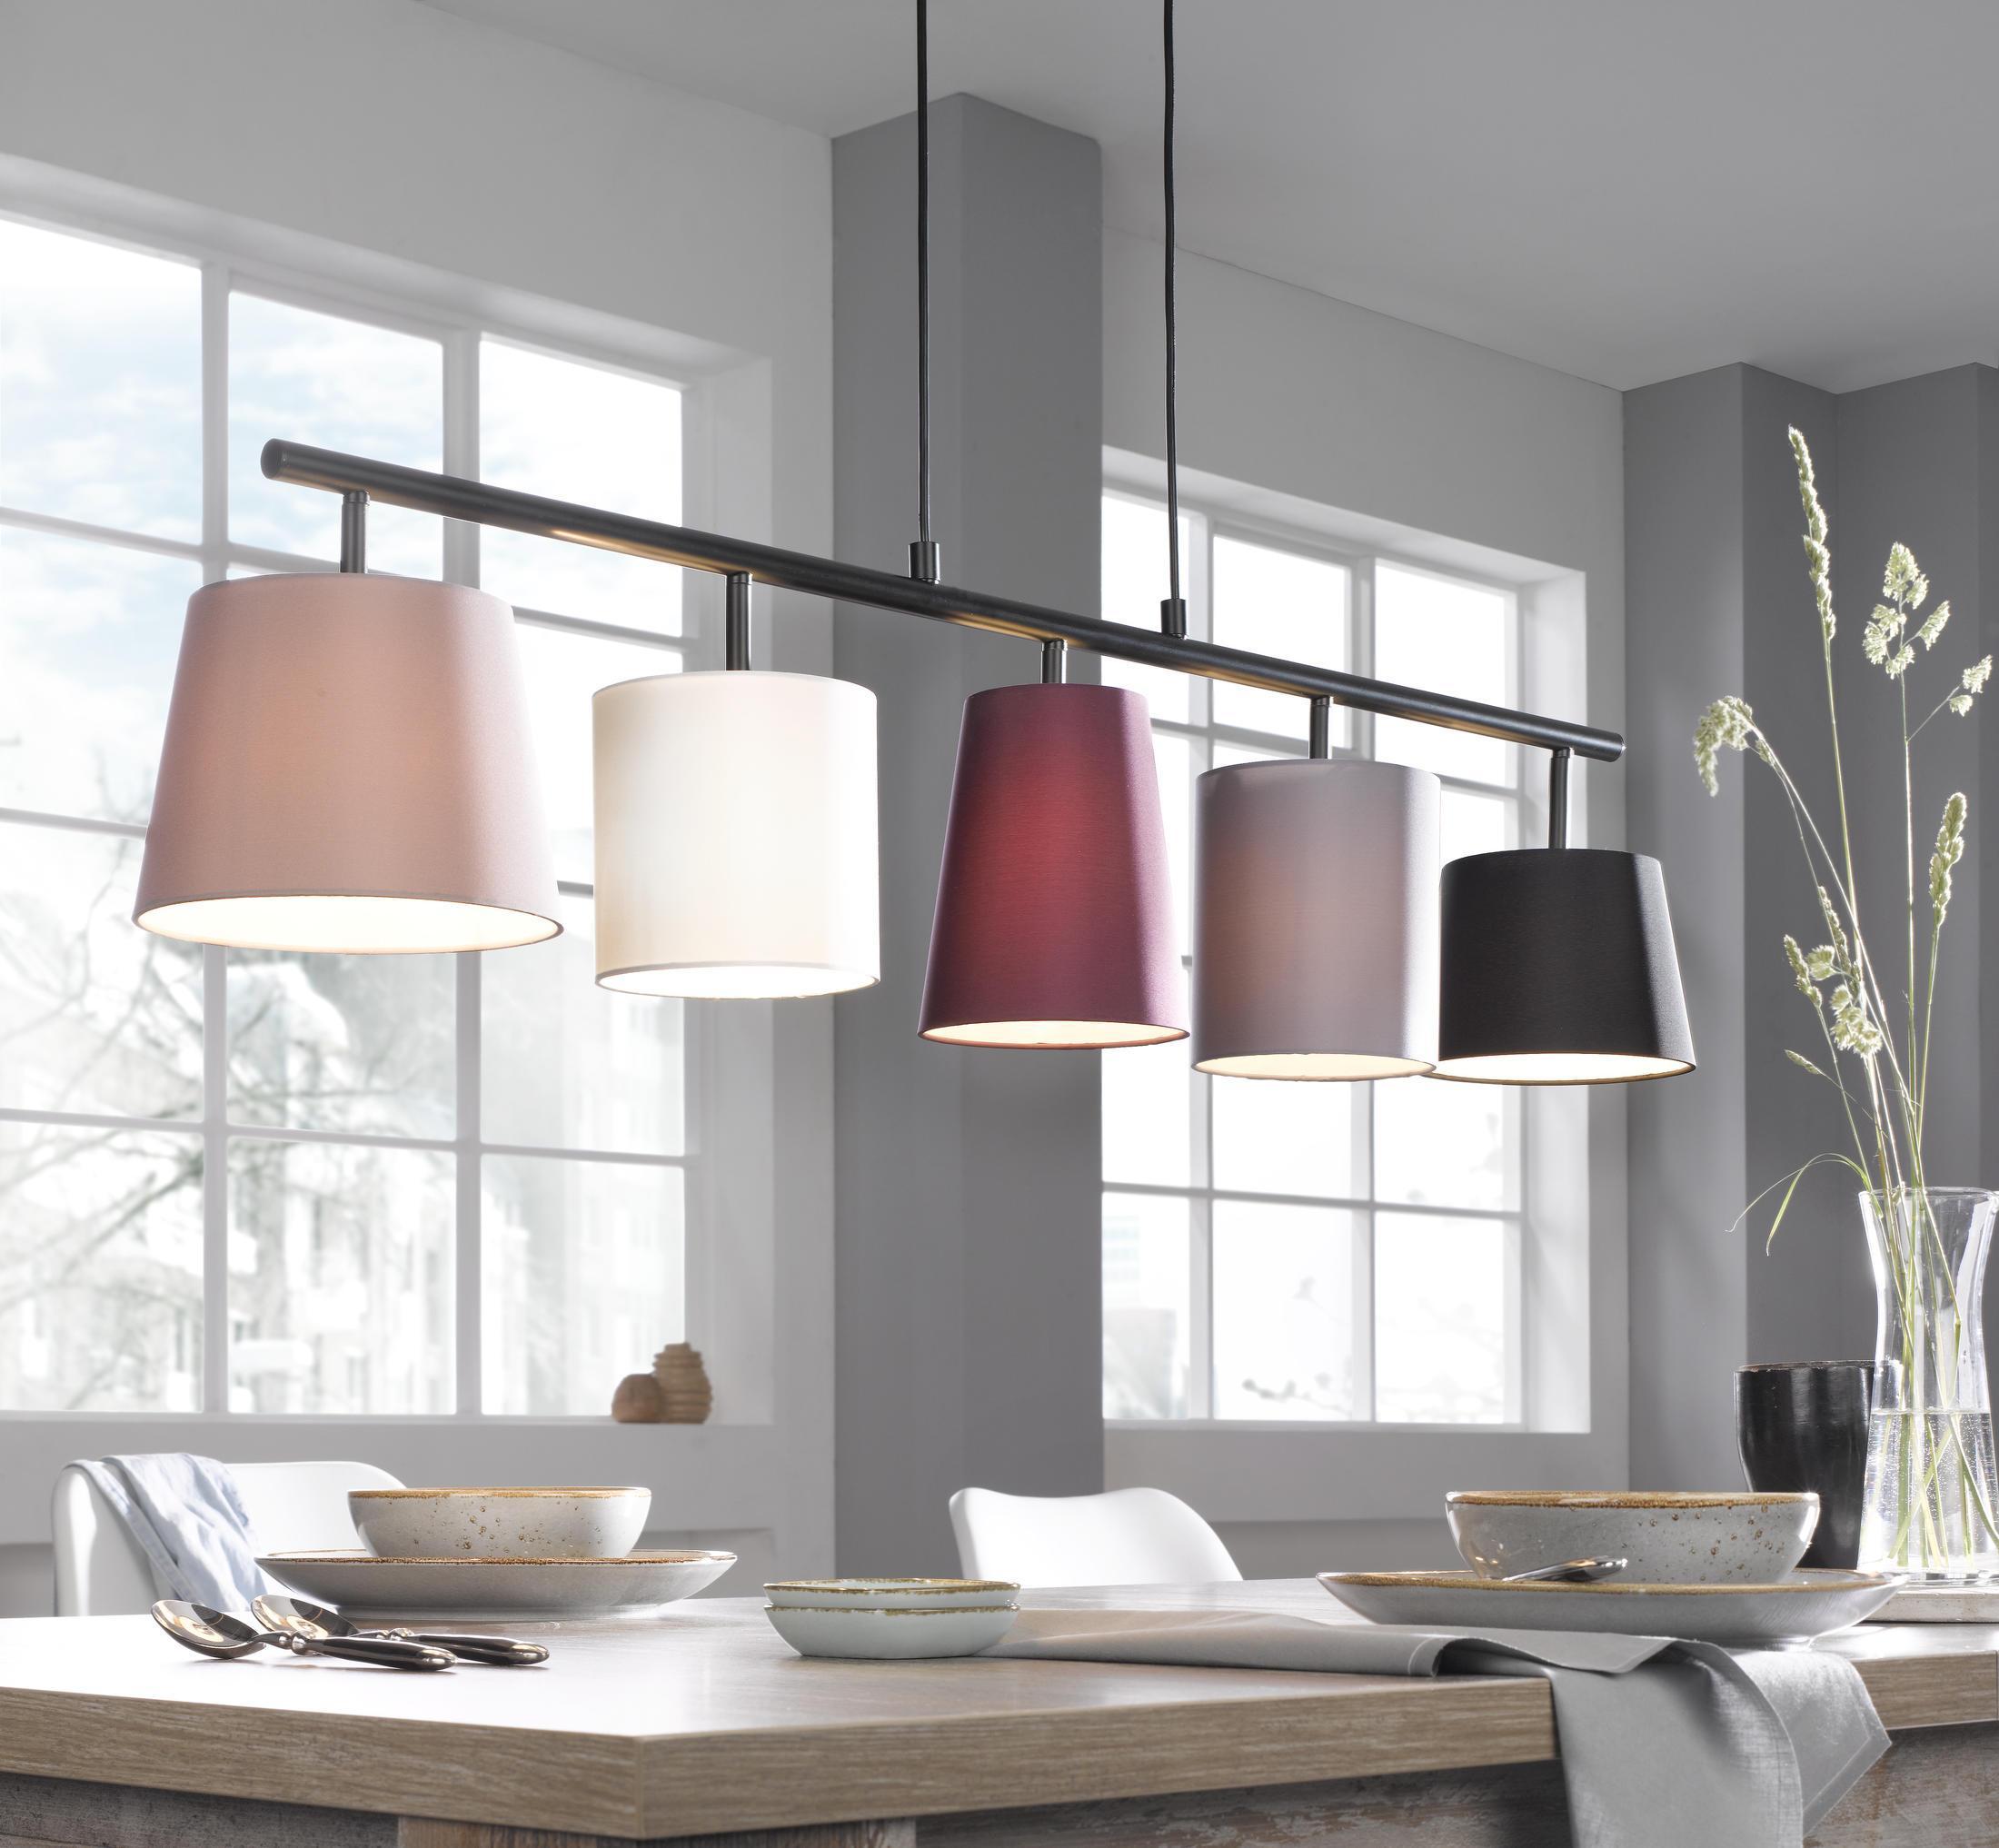 Moderne Lampen bringen Licht ins Dunkel